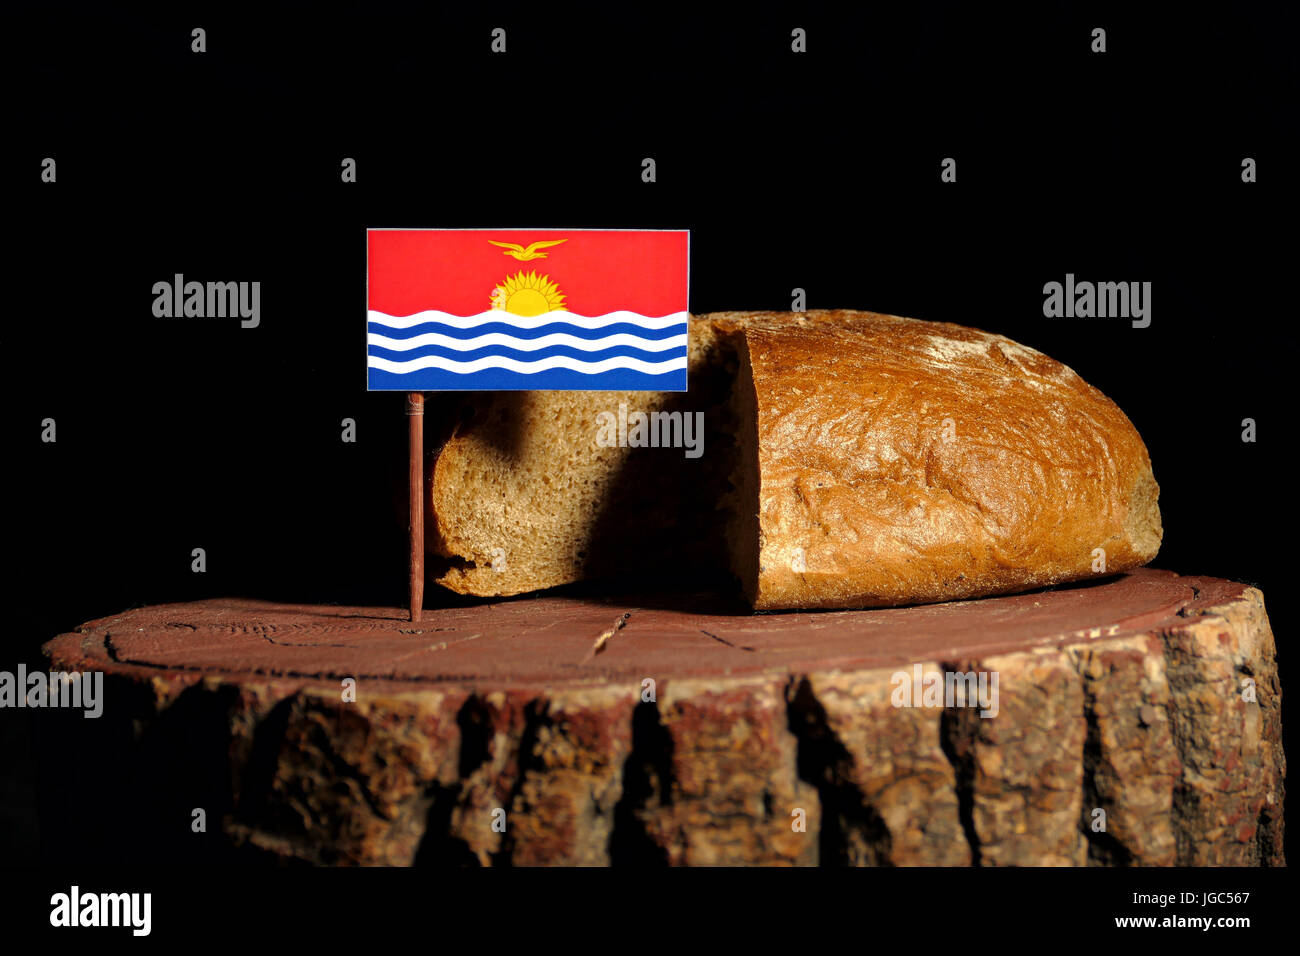 Kiribati flag on a stump with bread isolated - Stock Image